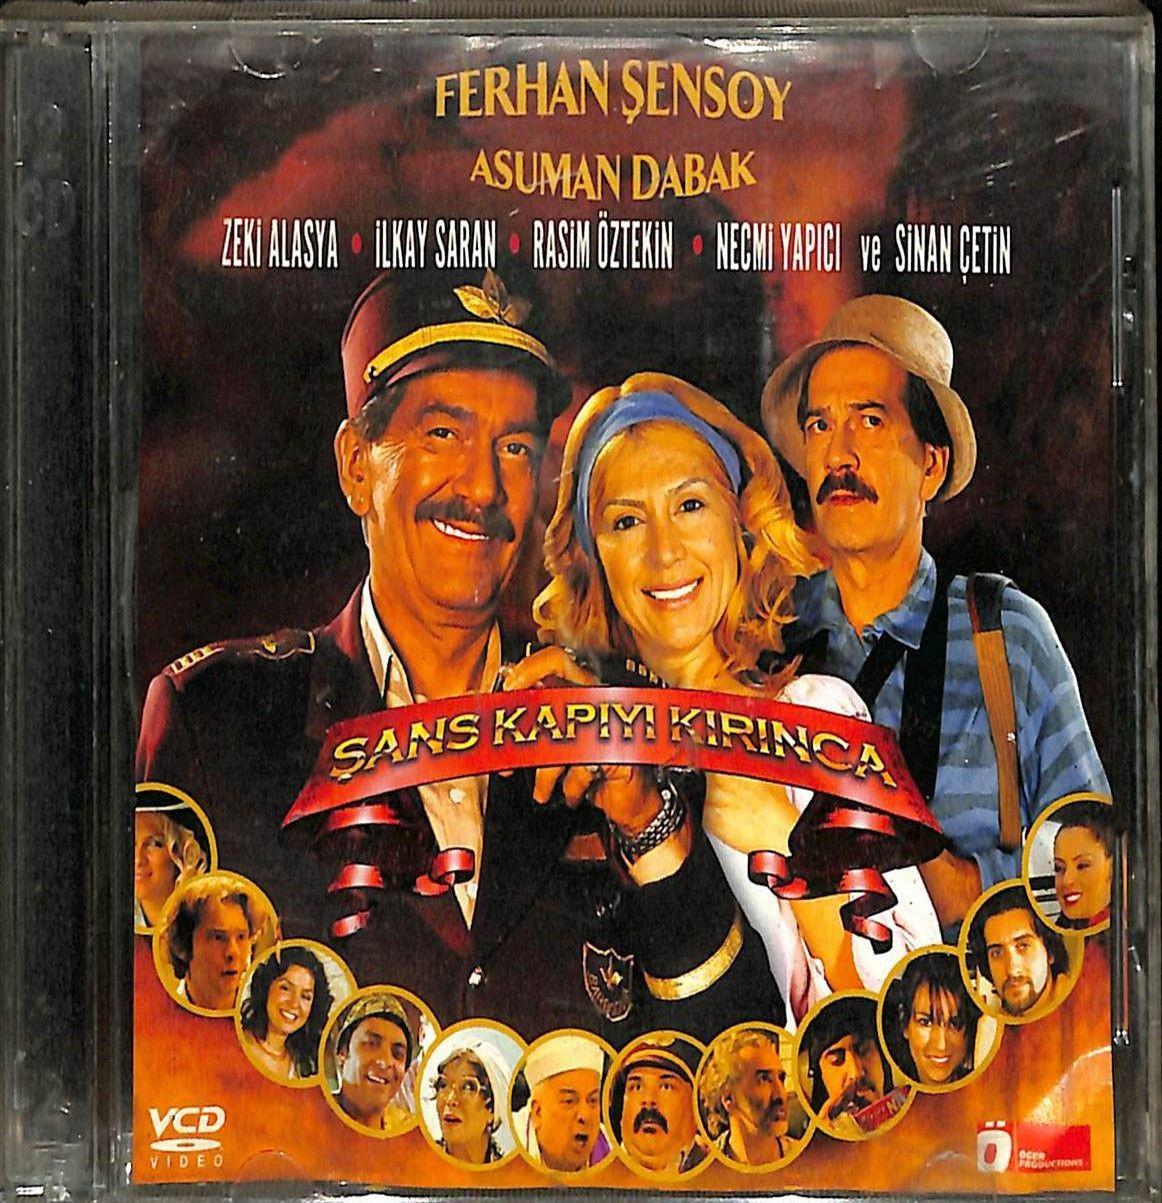 Mutlaka izlenmesi gereken Ferhan Şensoy filmleri - Page 4